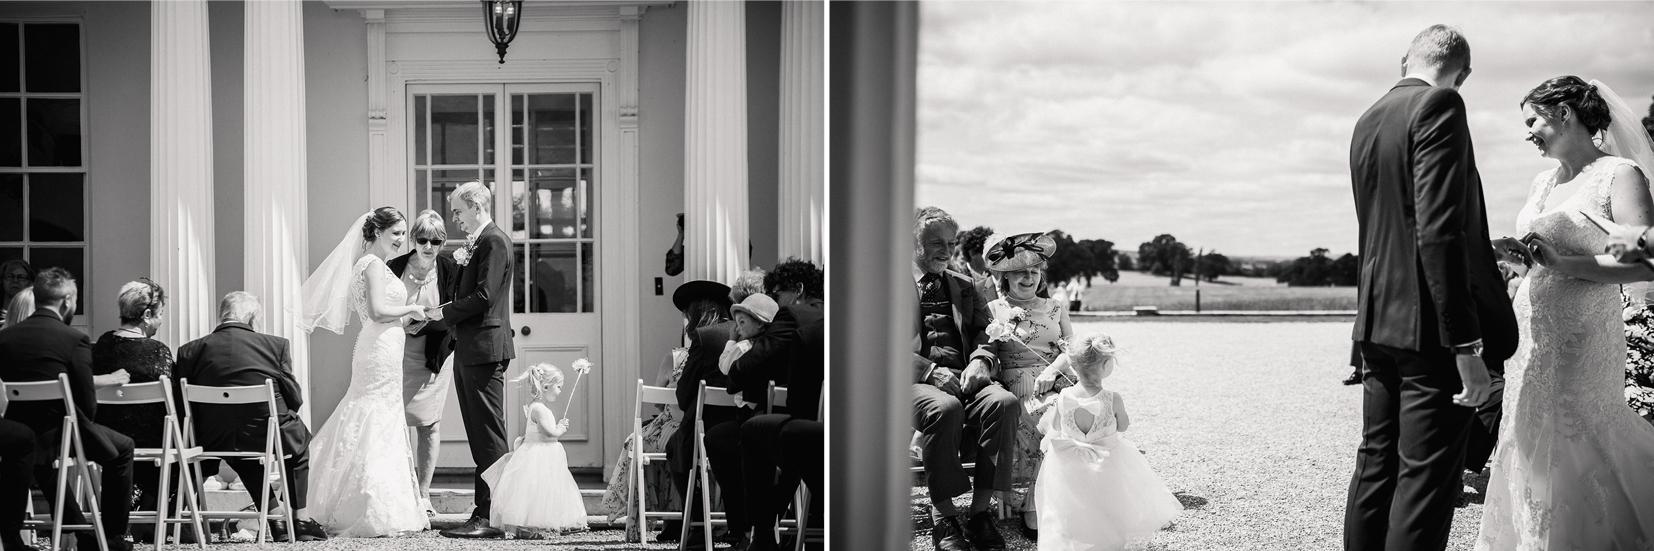 1Rockbeare Manor Wedding Photography.jpg